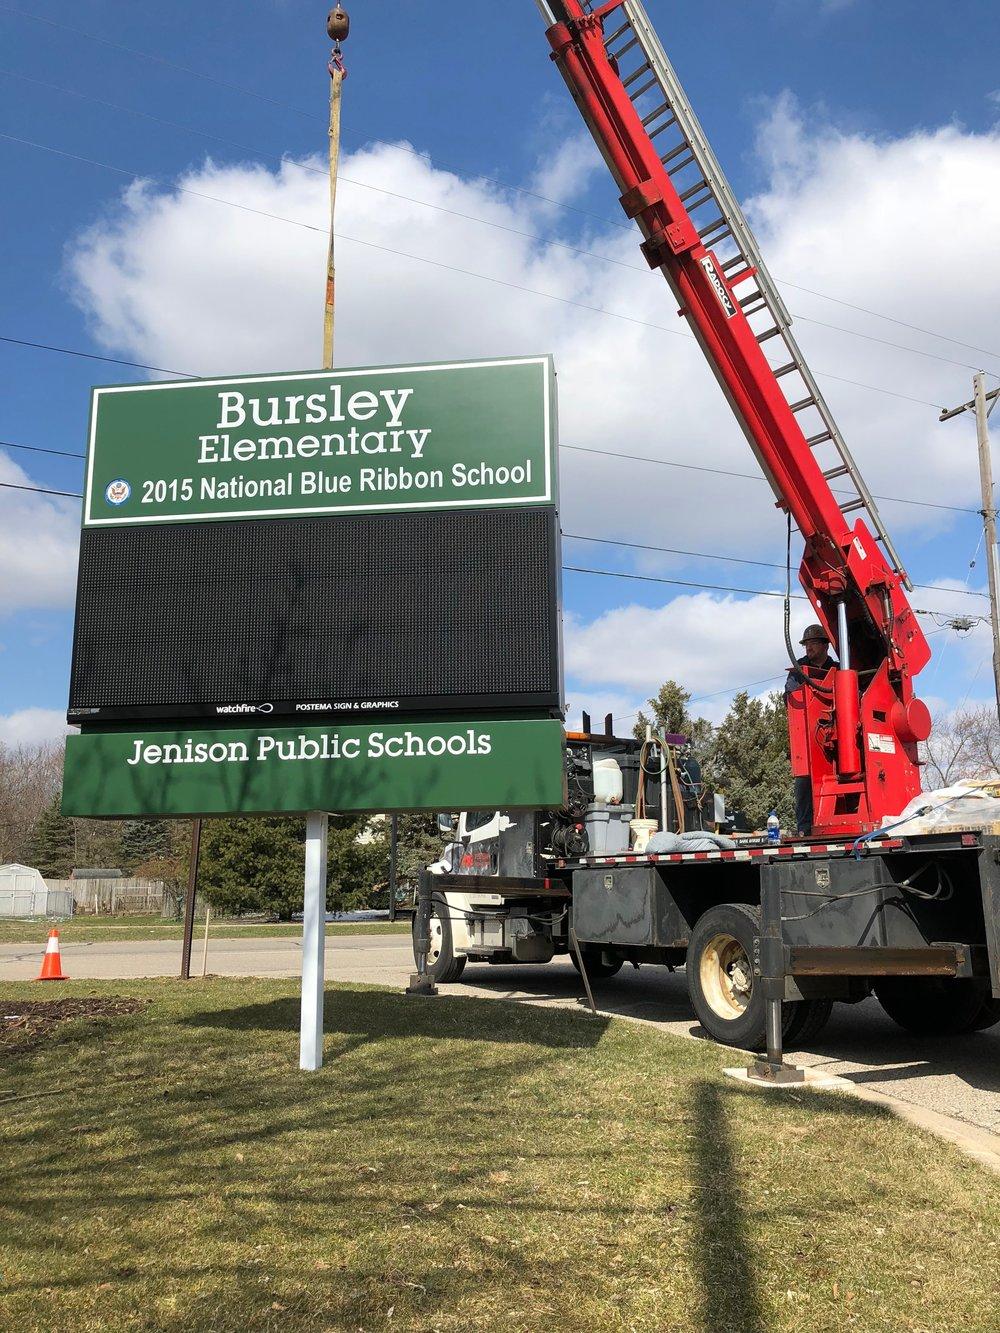 Bursley Elementary - Jenison Public Schools (3) 4.5.18.JPG